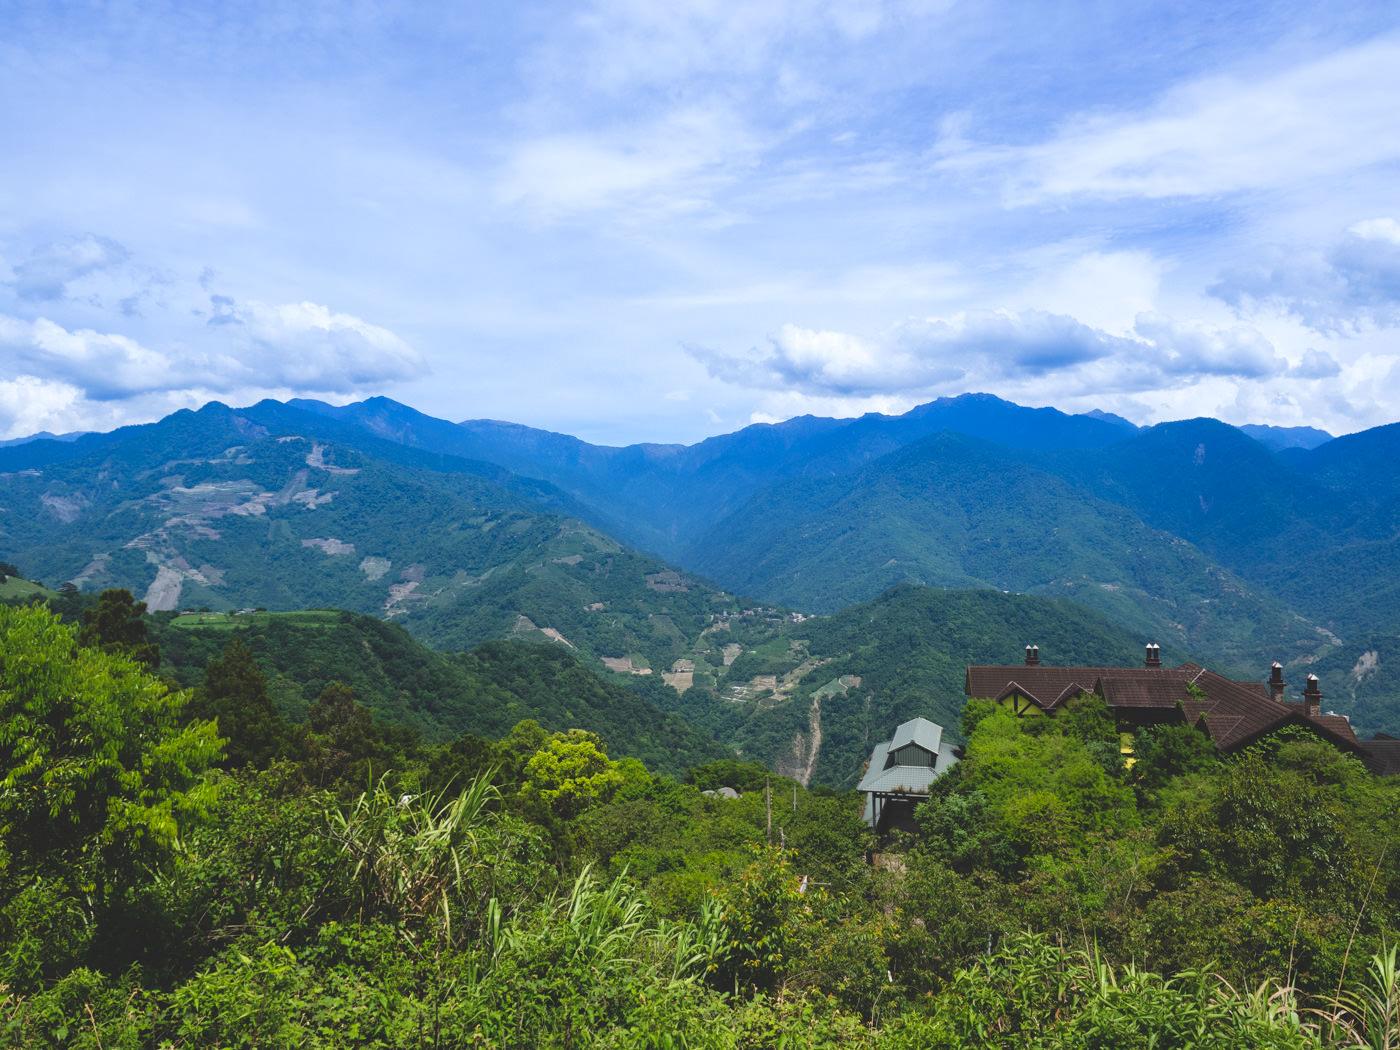 Drive up to Qingjing Farm